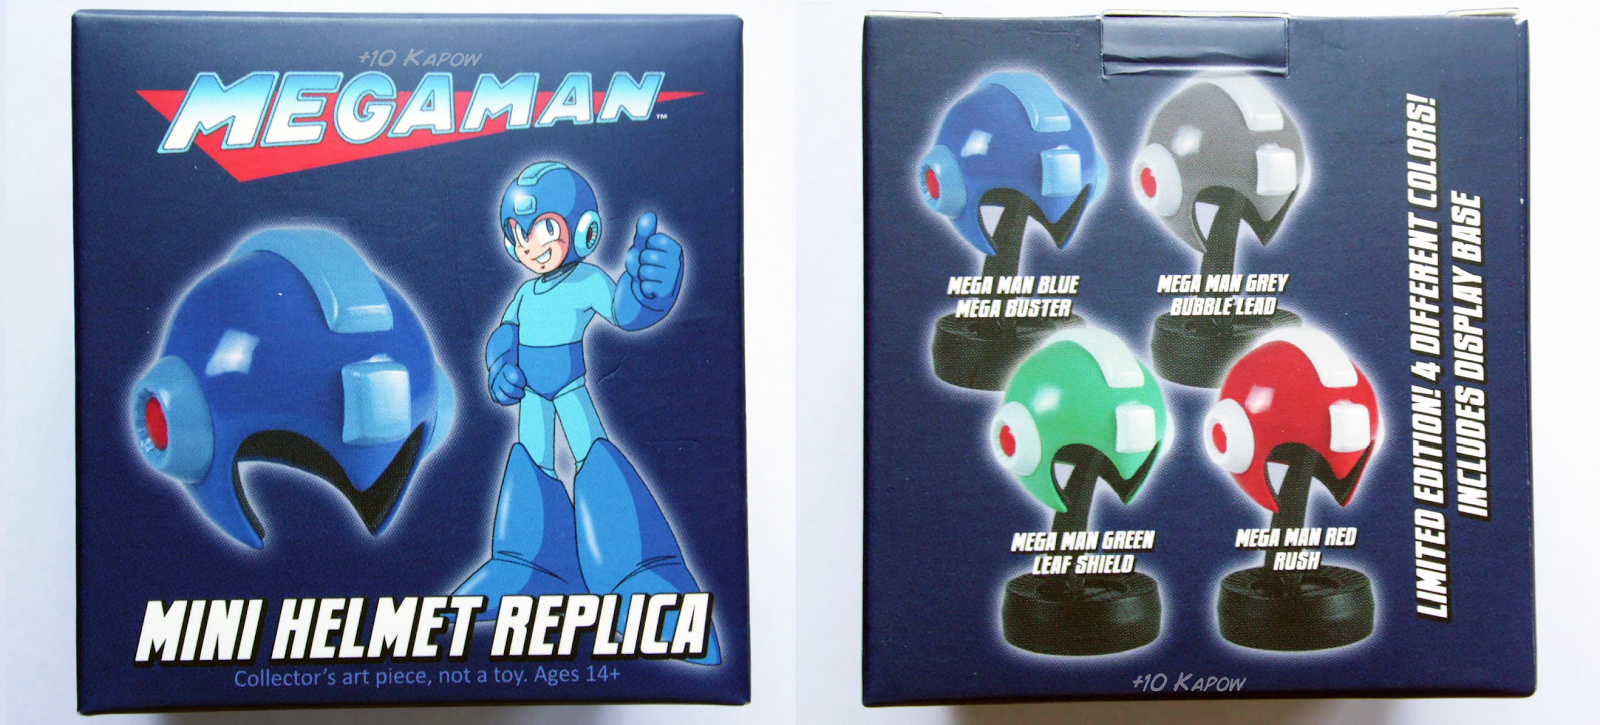 Loot Crate Exclusive Rush Red Megaman Mini Helmet Replica